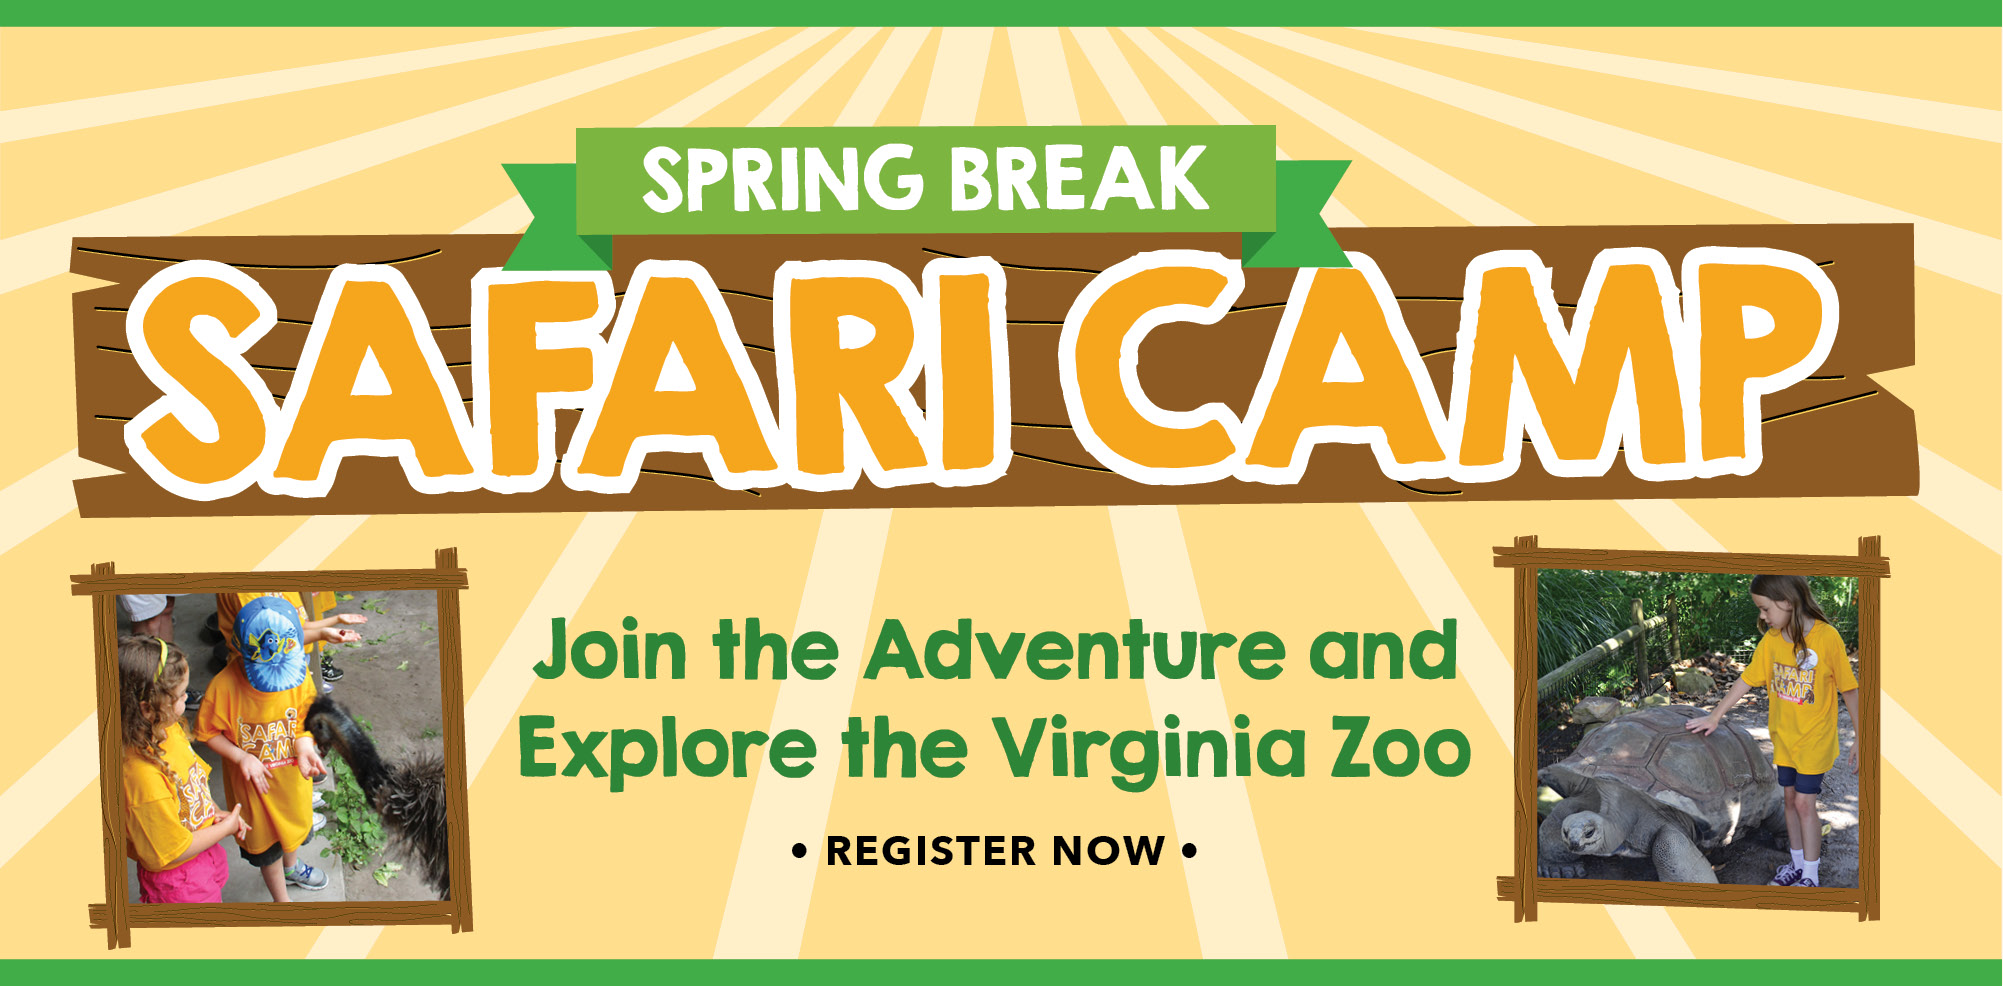 VAZOO_Safari Camp 2017 Web banner